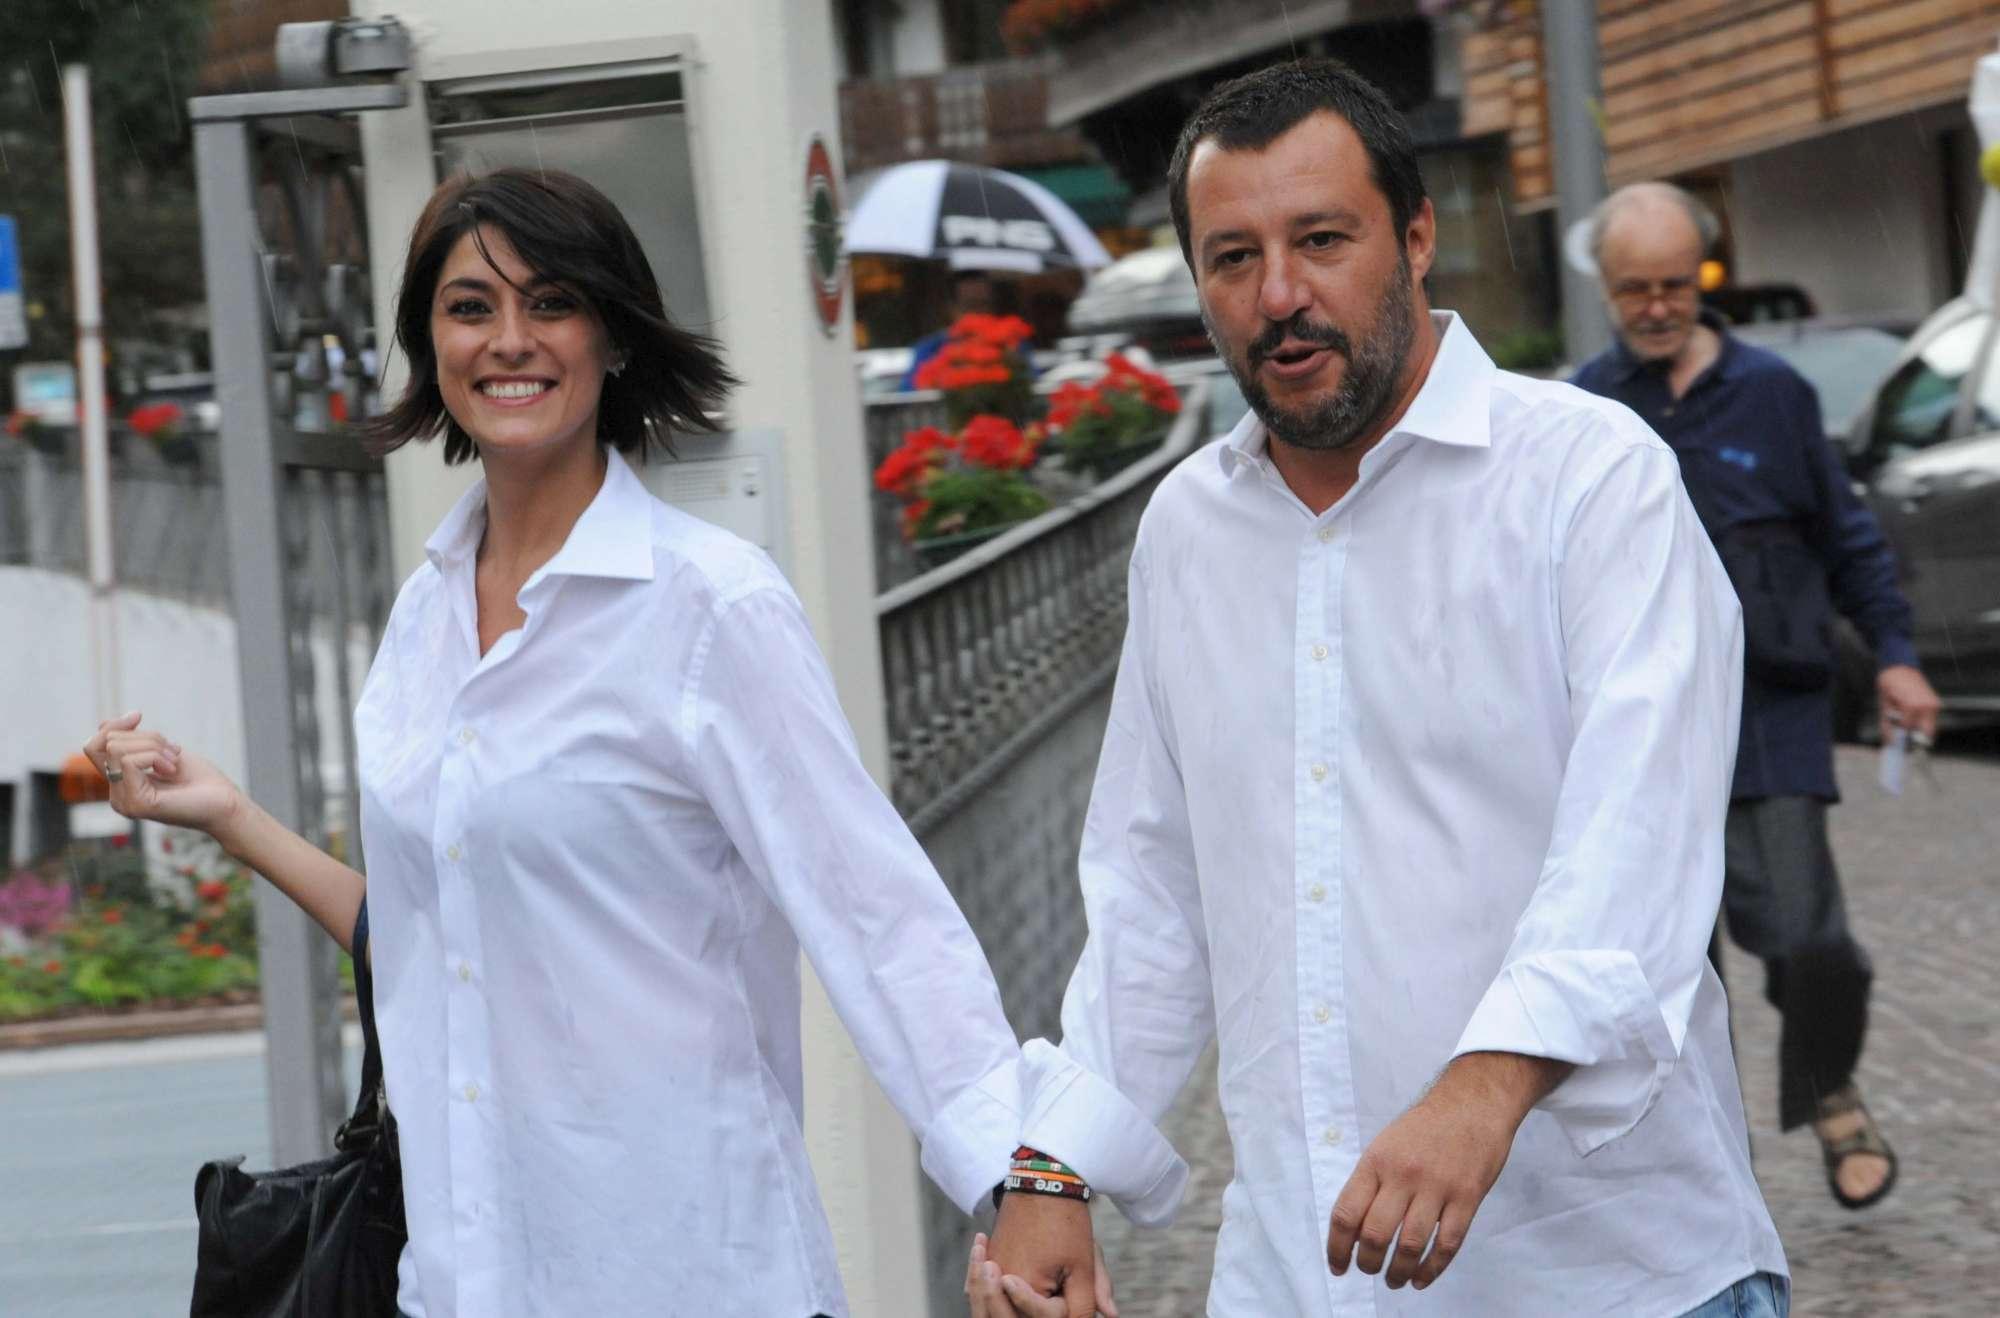 Matteo Salvini ed Elisa Isoardi mano nella mano a Cortina